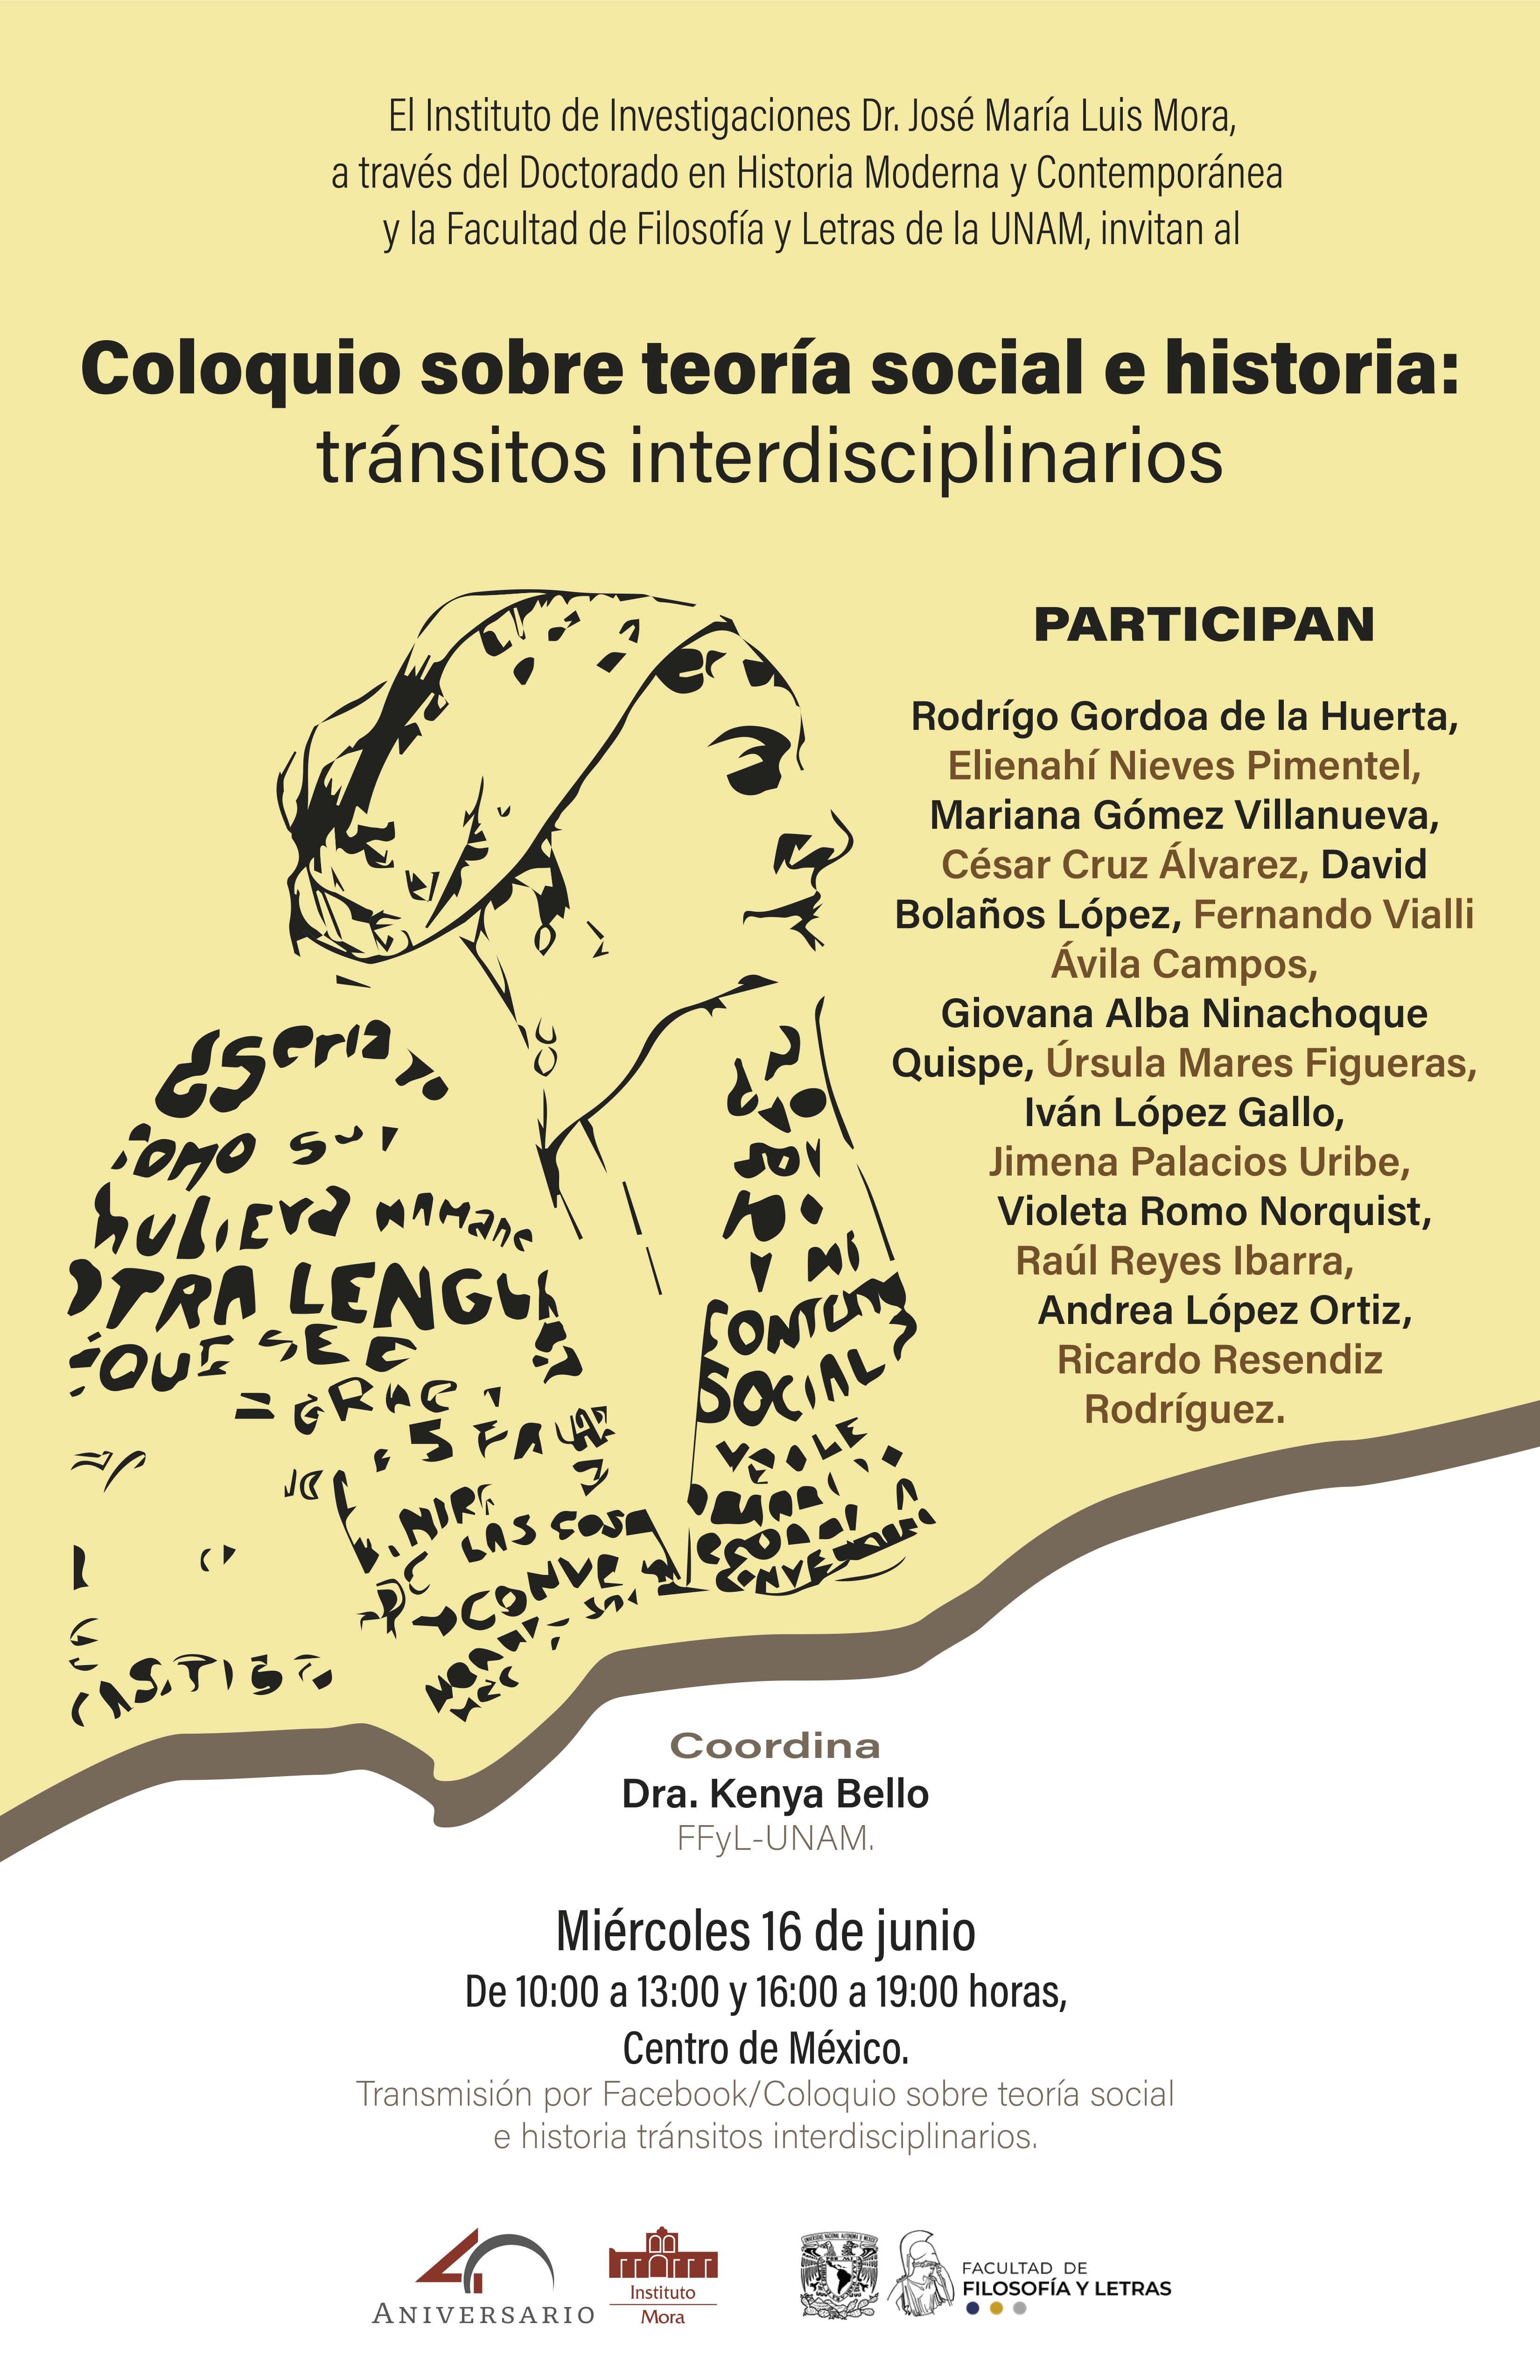 https://www.institutomora.edu.mx/Instituto/IE/1017_IECol18-0621.jpg